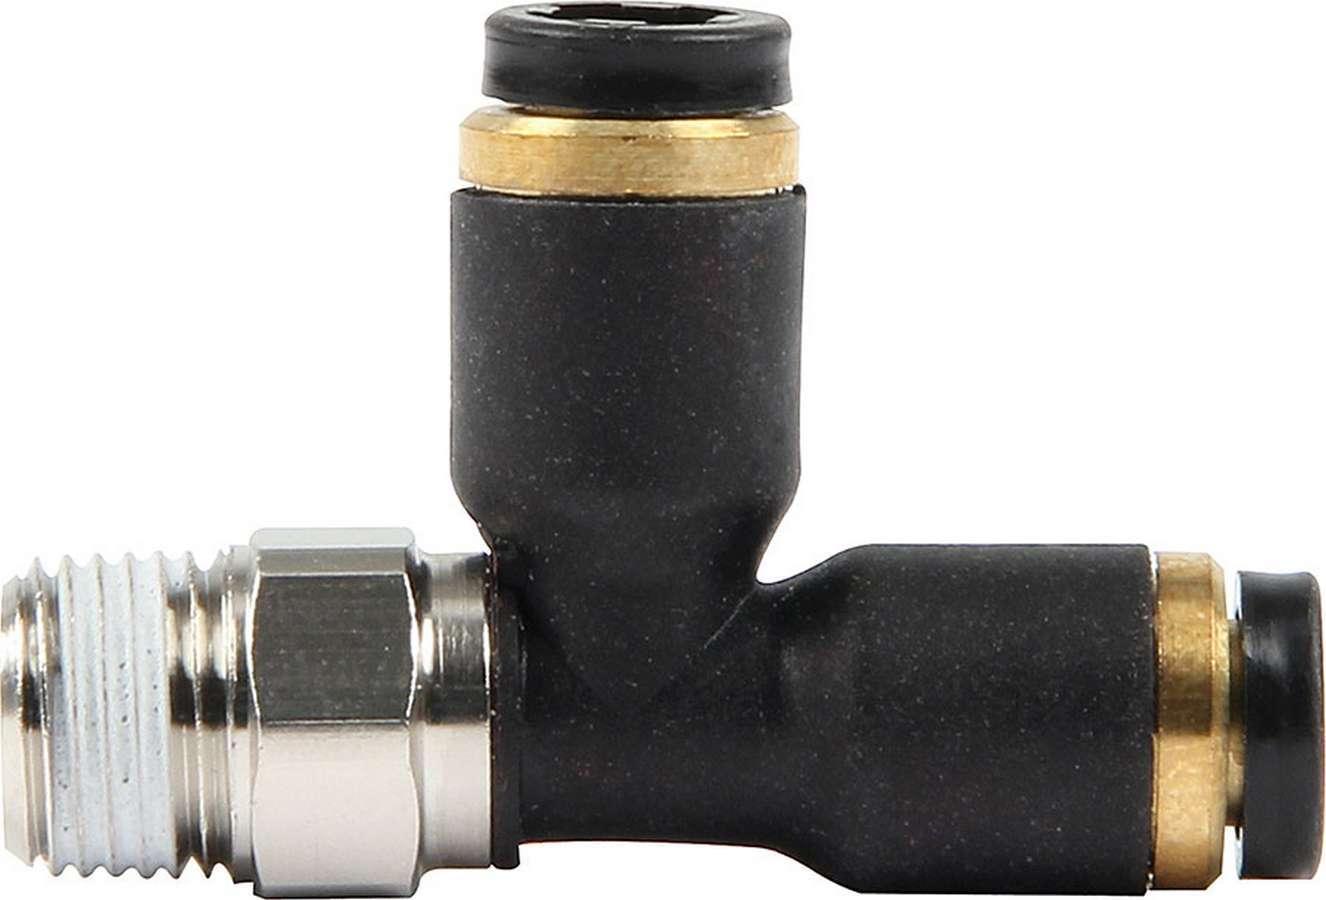 Allstar Performance 48023 Fitting, Adapter Tee, 3/16 in Female Pushlock x 3/16 in Female Pushlock x 1/8 in NPT Male, Plastic / Steel, Black, Nylon Hose, Each